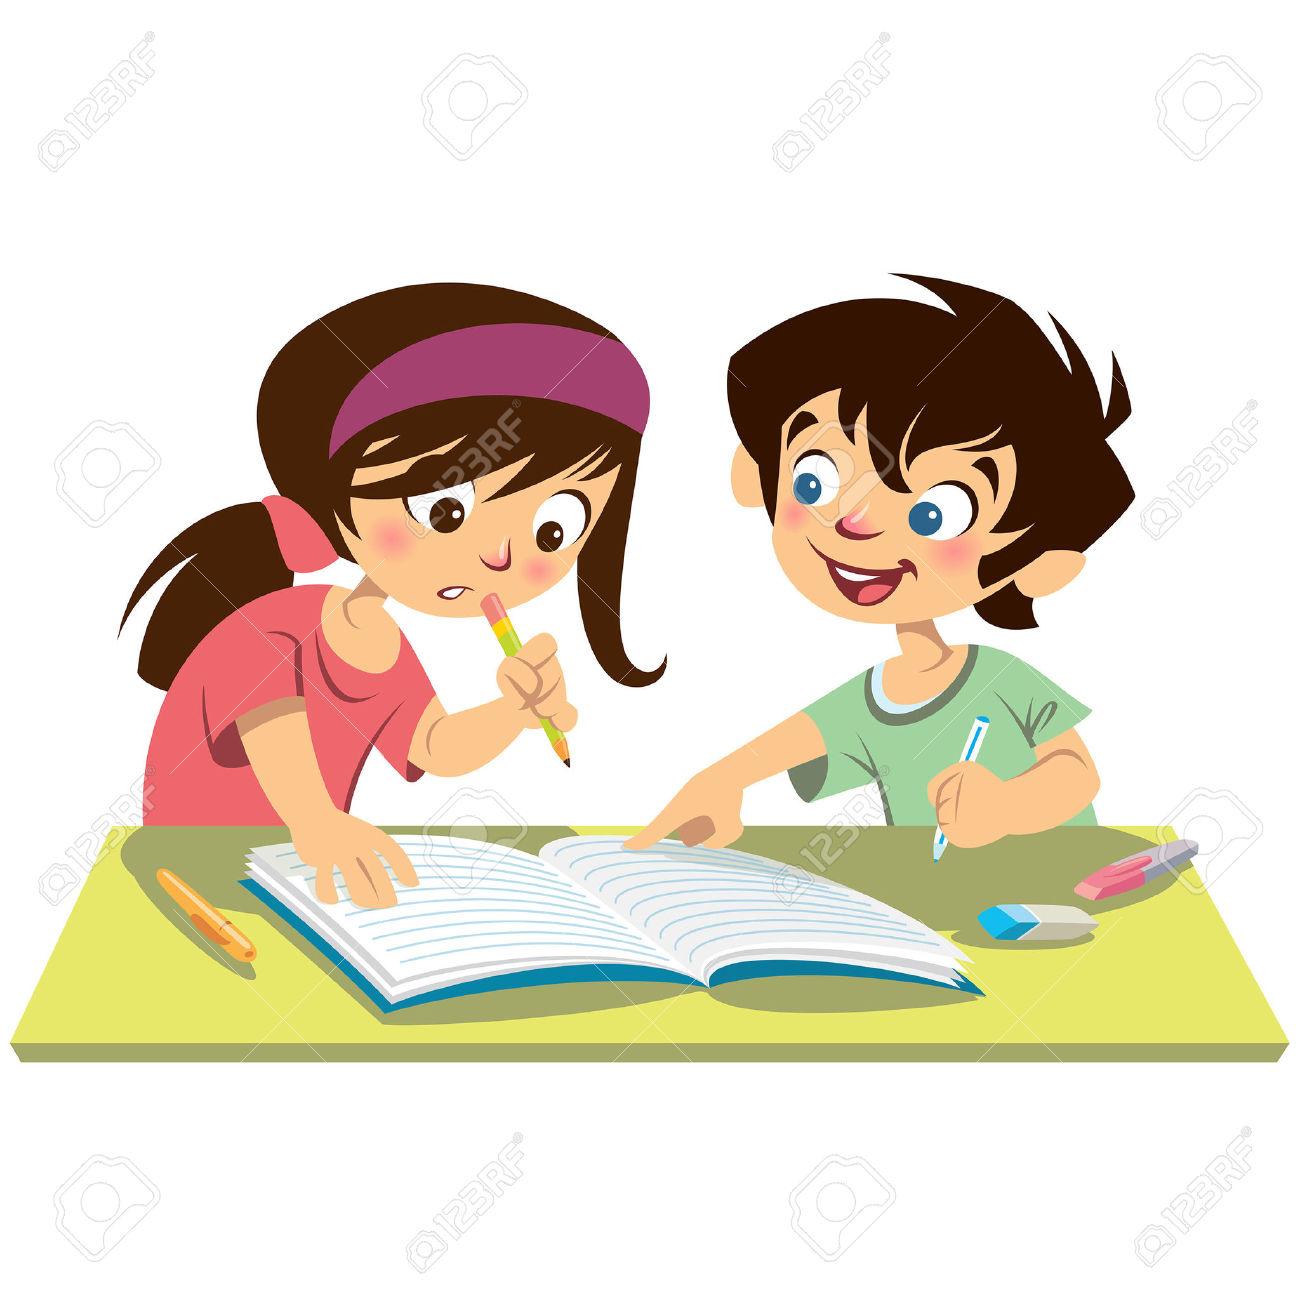 Boy turning in assignment clipart. Clipartfox homework children